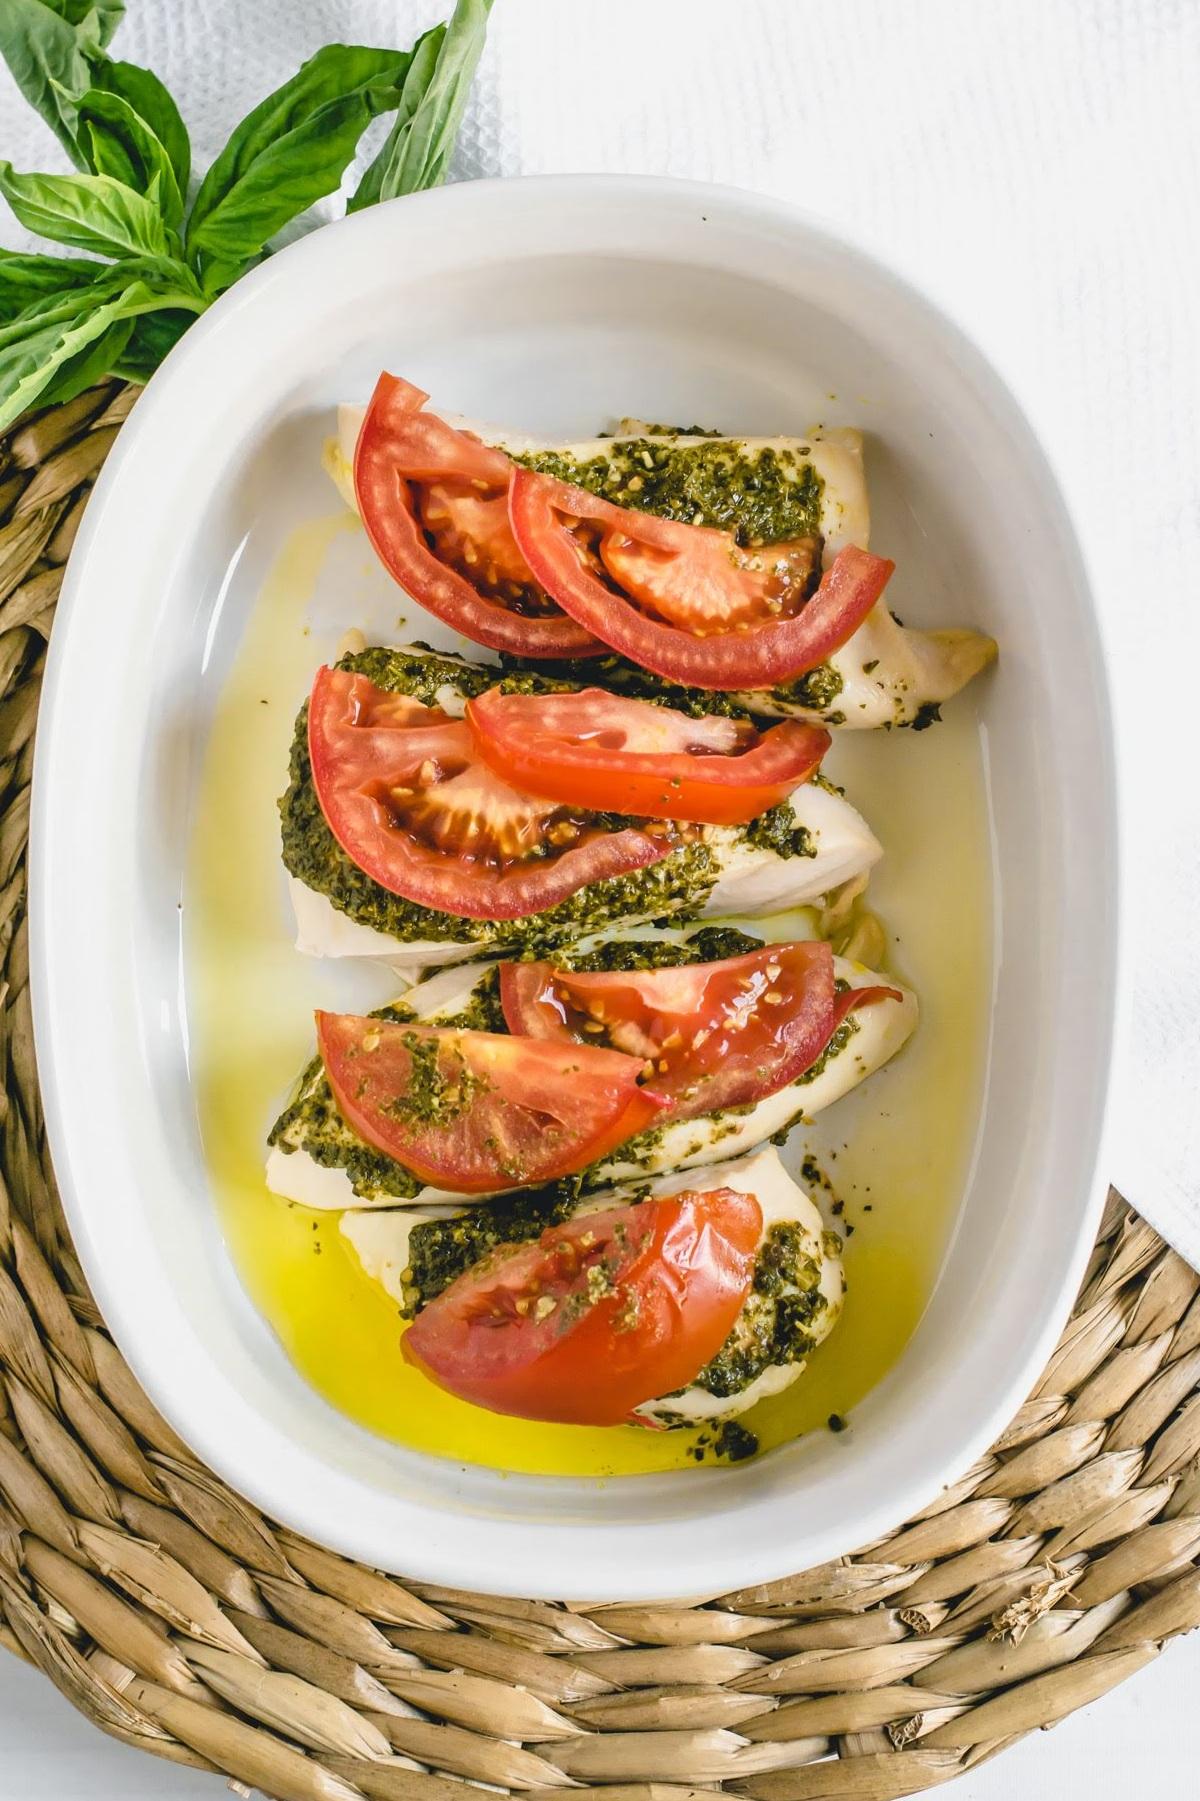 Pesto Baked Chicken - Eleat Nutrition